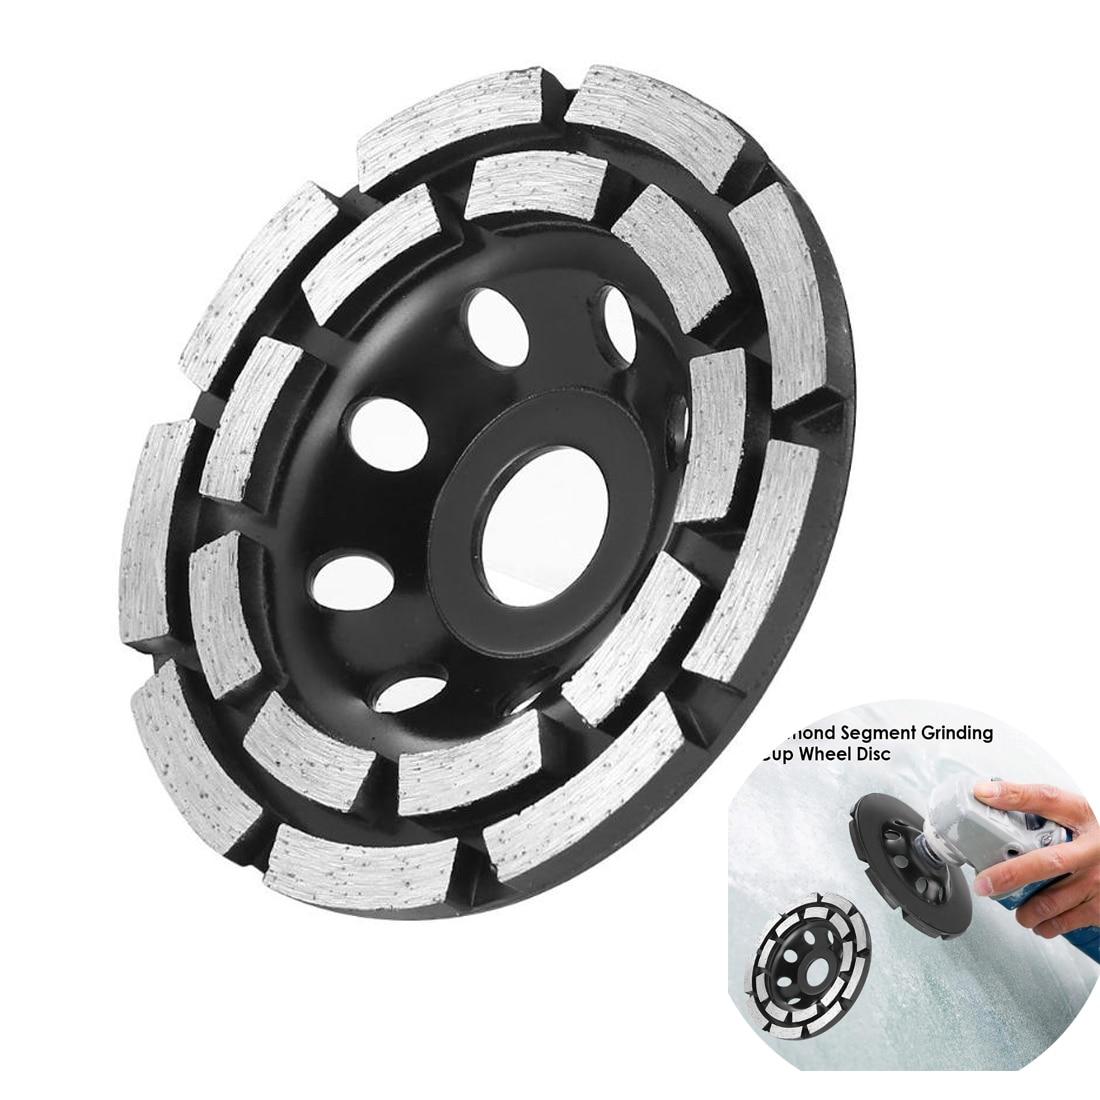 115/125/180mm Diamond Grinding Disc Abrasives Concrete Tools Grinder Wheel Metalworking Cutting Grinding Wheel Cup Saw Blade|Grinding Wheels| |  - title=